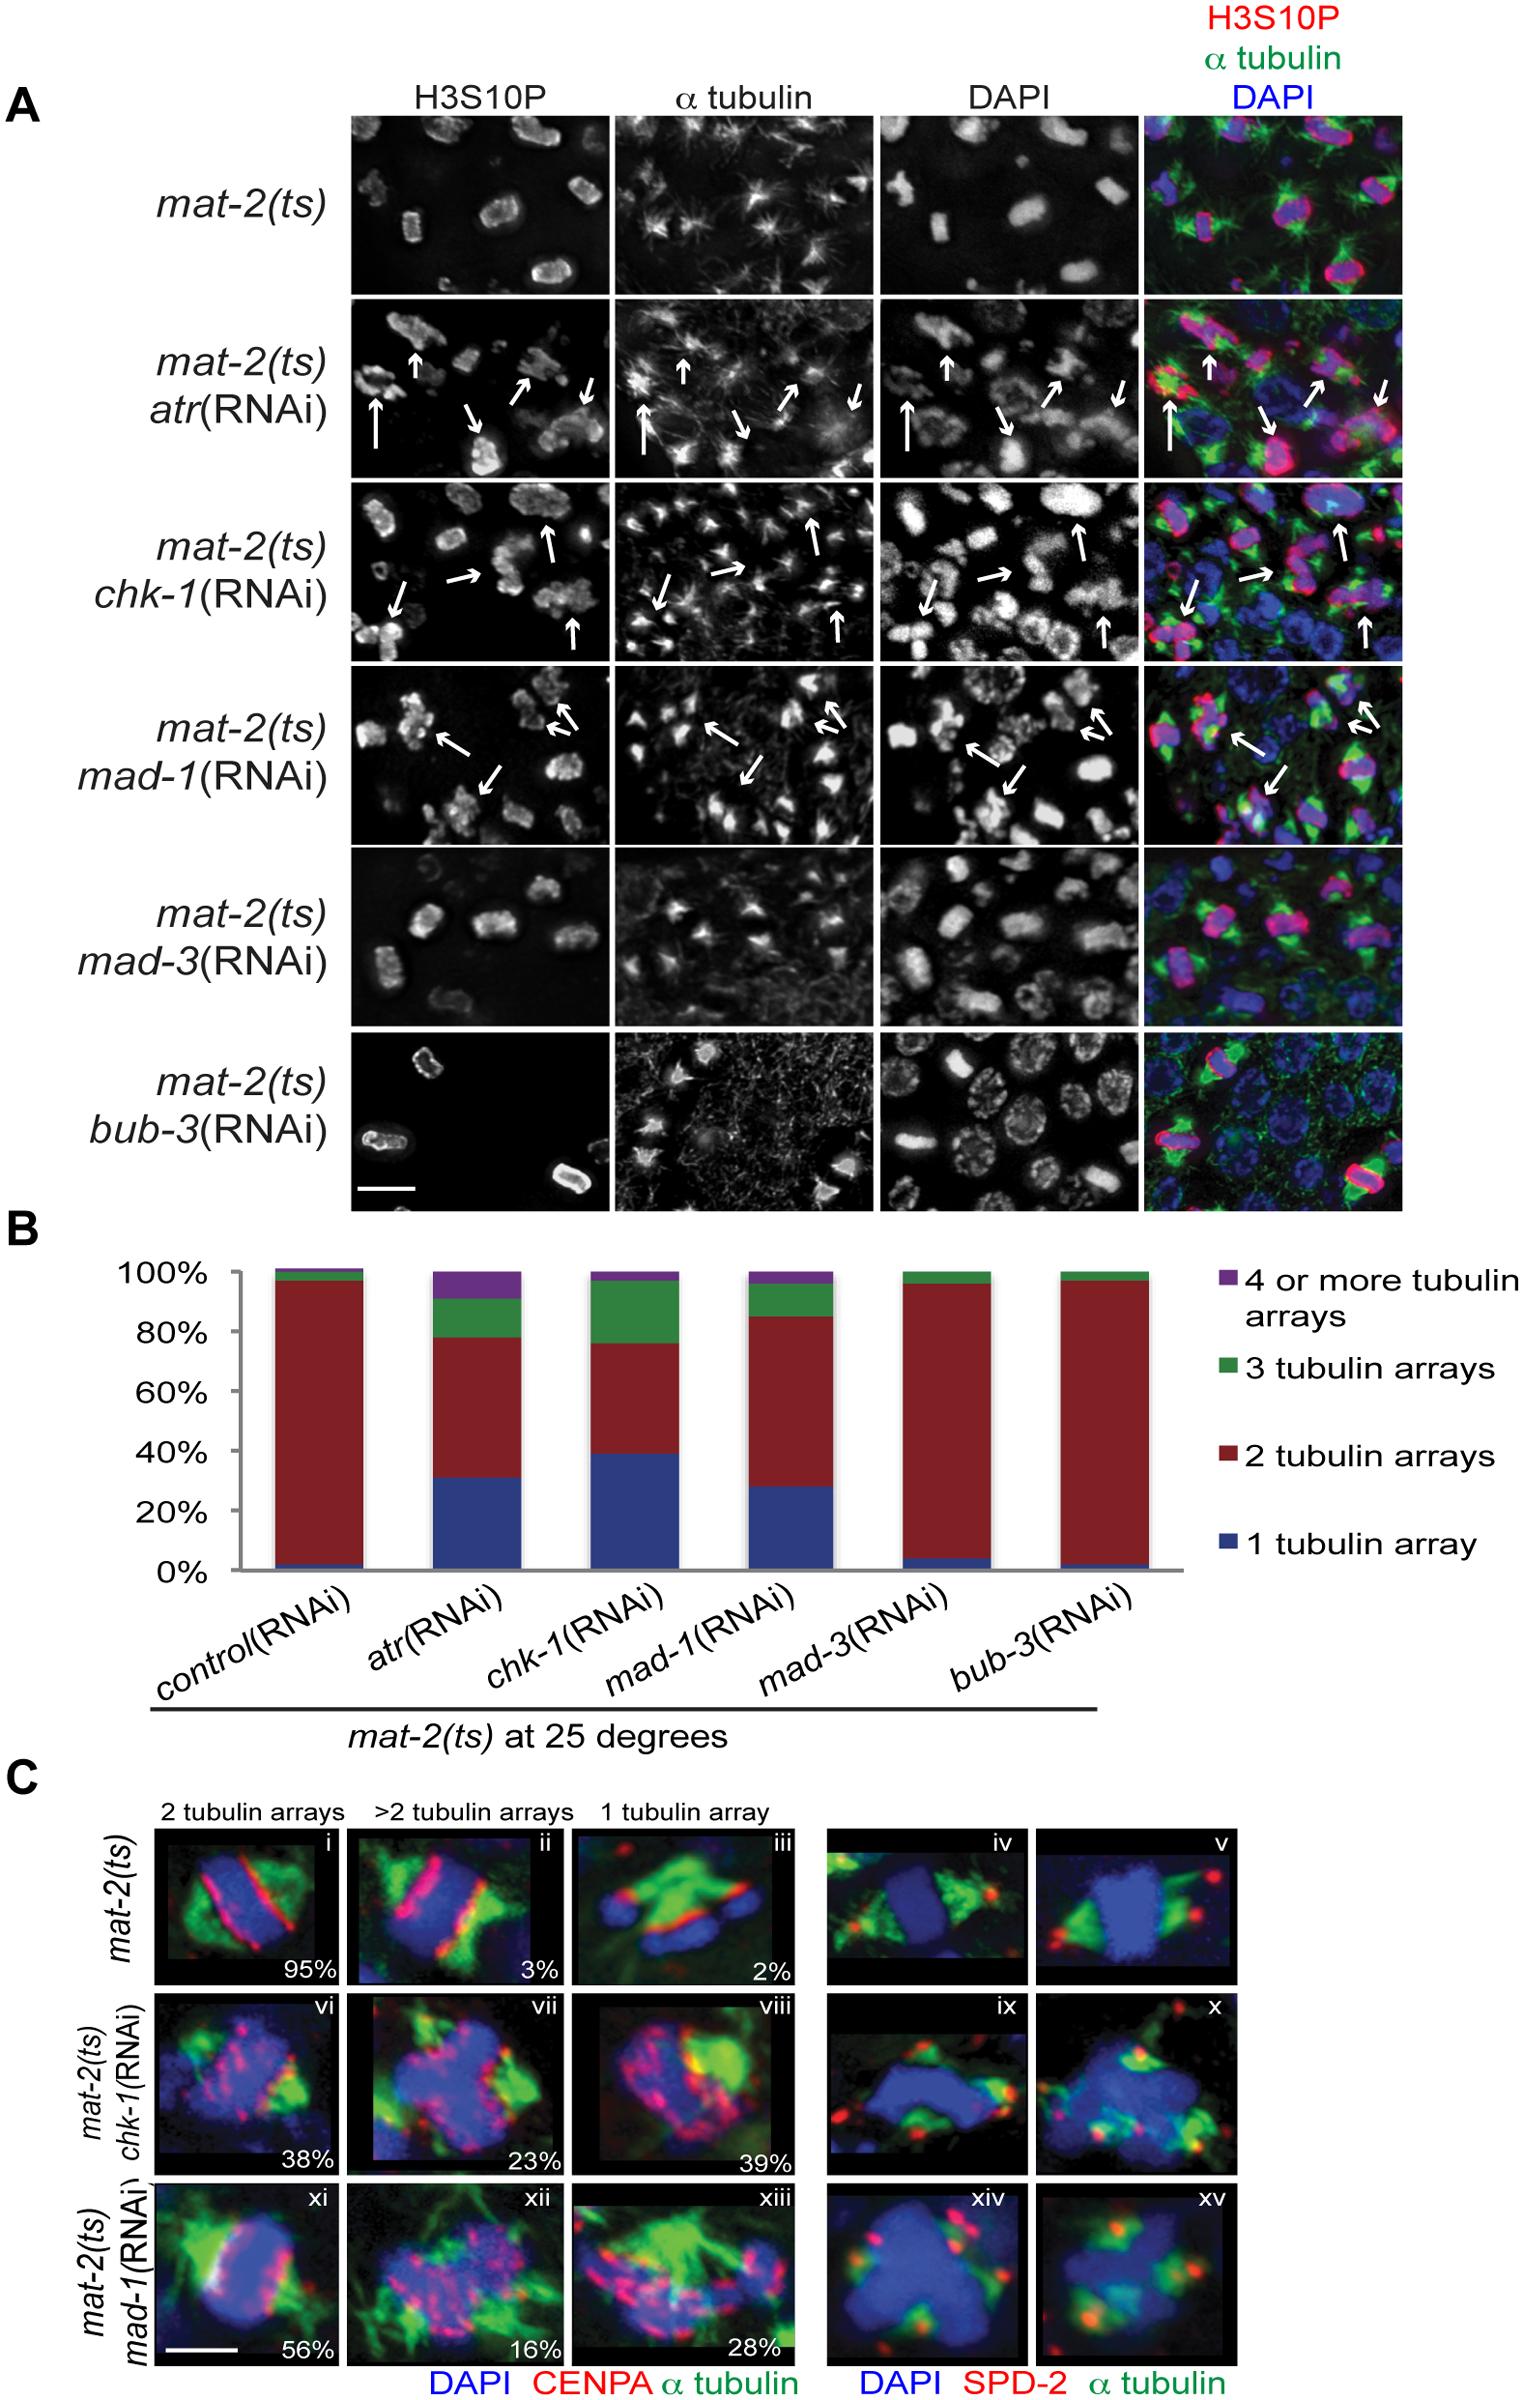 Both DDR and SAC depletion lead to aberrant spindles and DNA morphology during metaphase arrest.